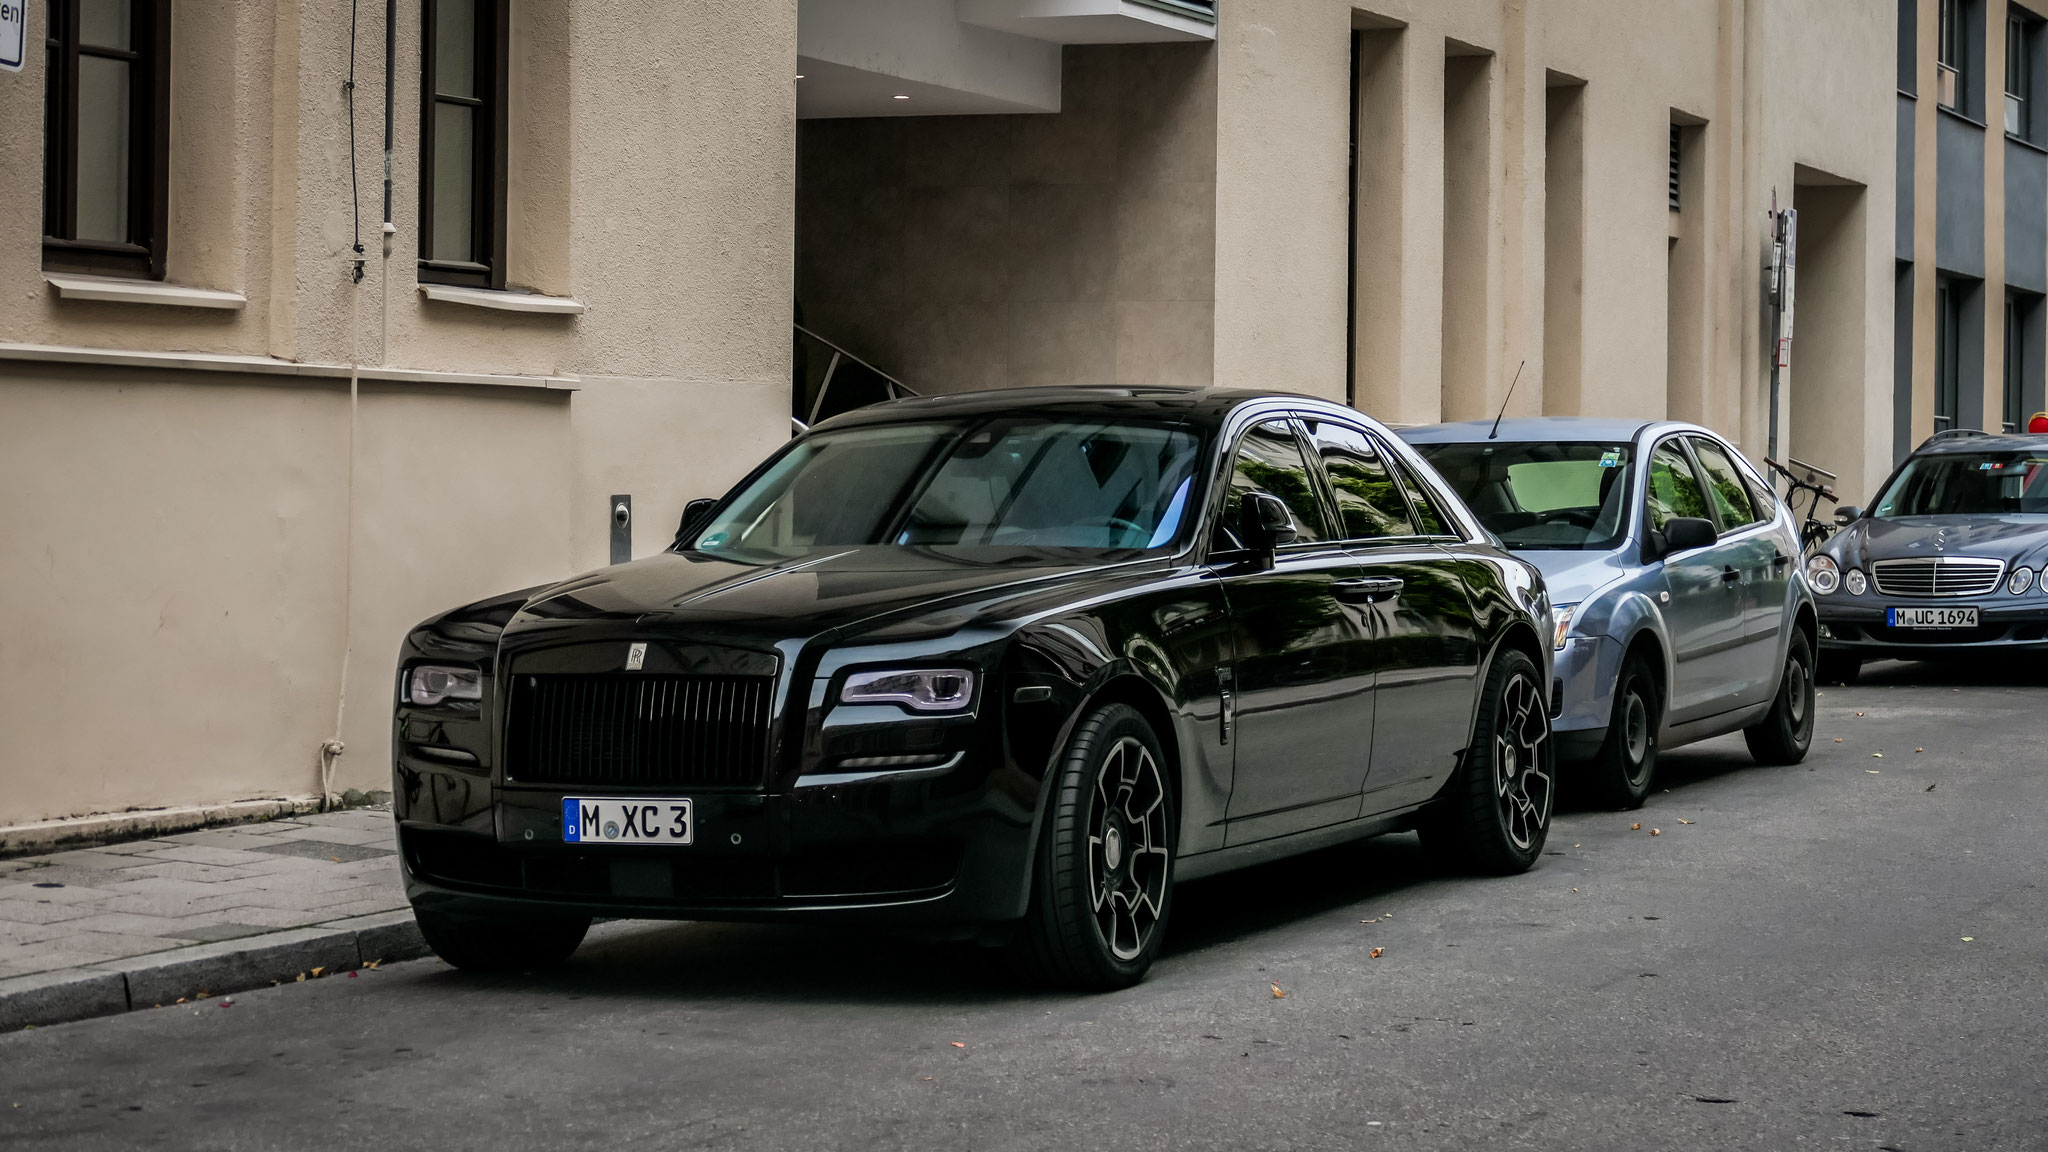 Rolls Royce Ghost Series II - M-XC-3